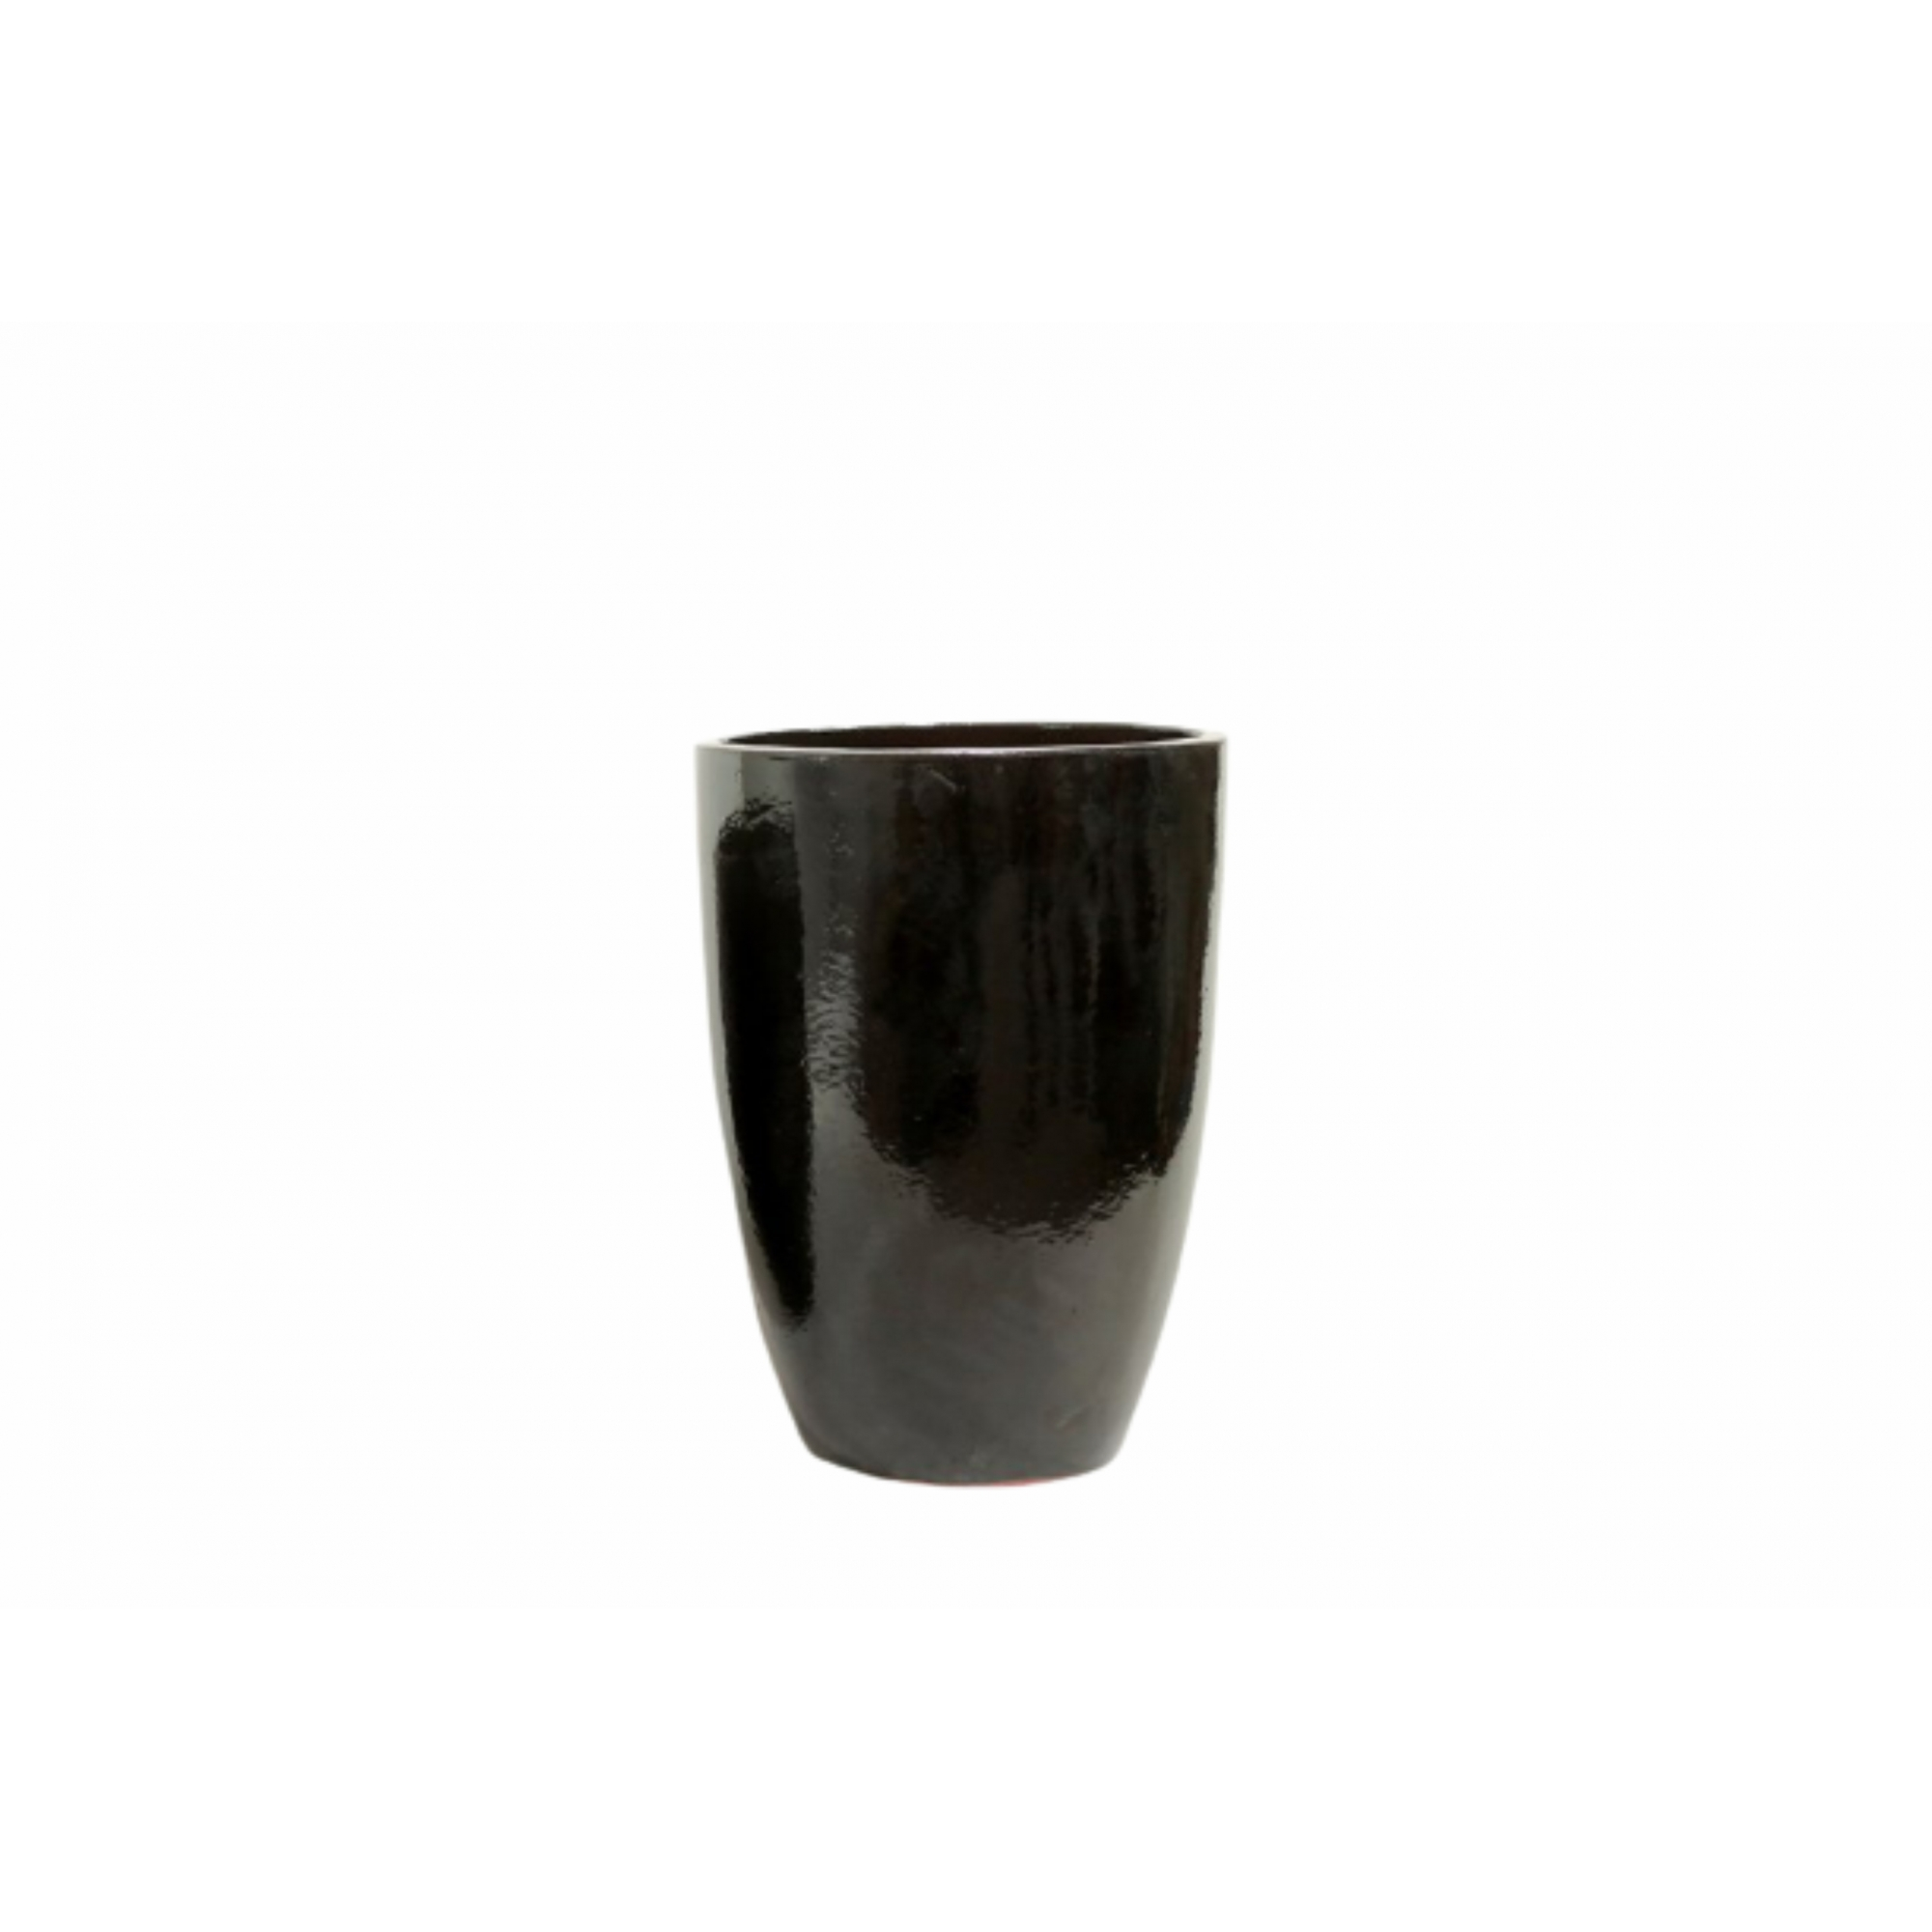 Vaso de Cerâmica Artesanal Preto Liv 35x51cm